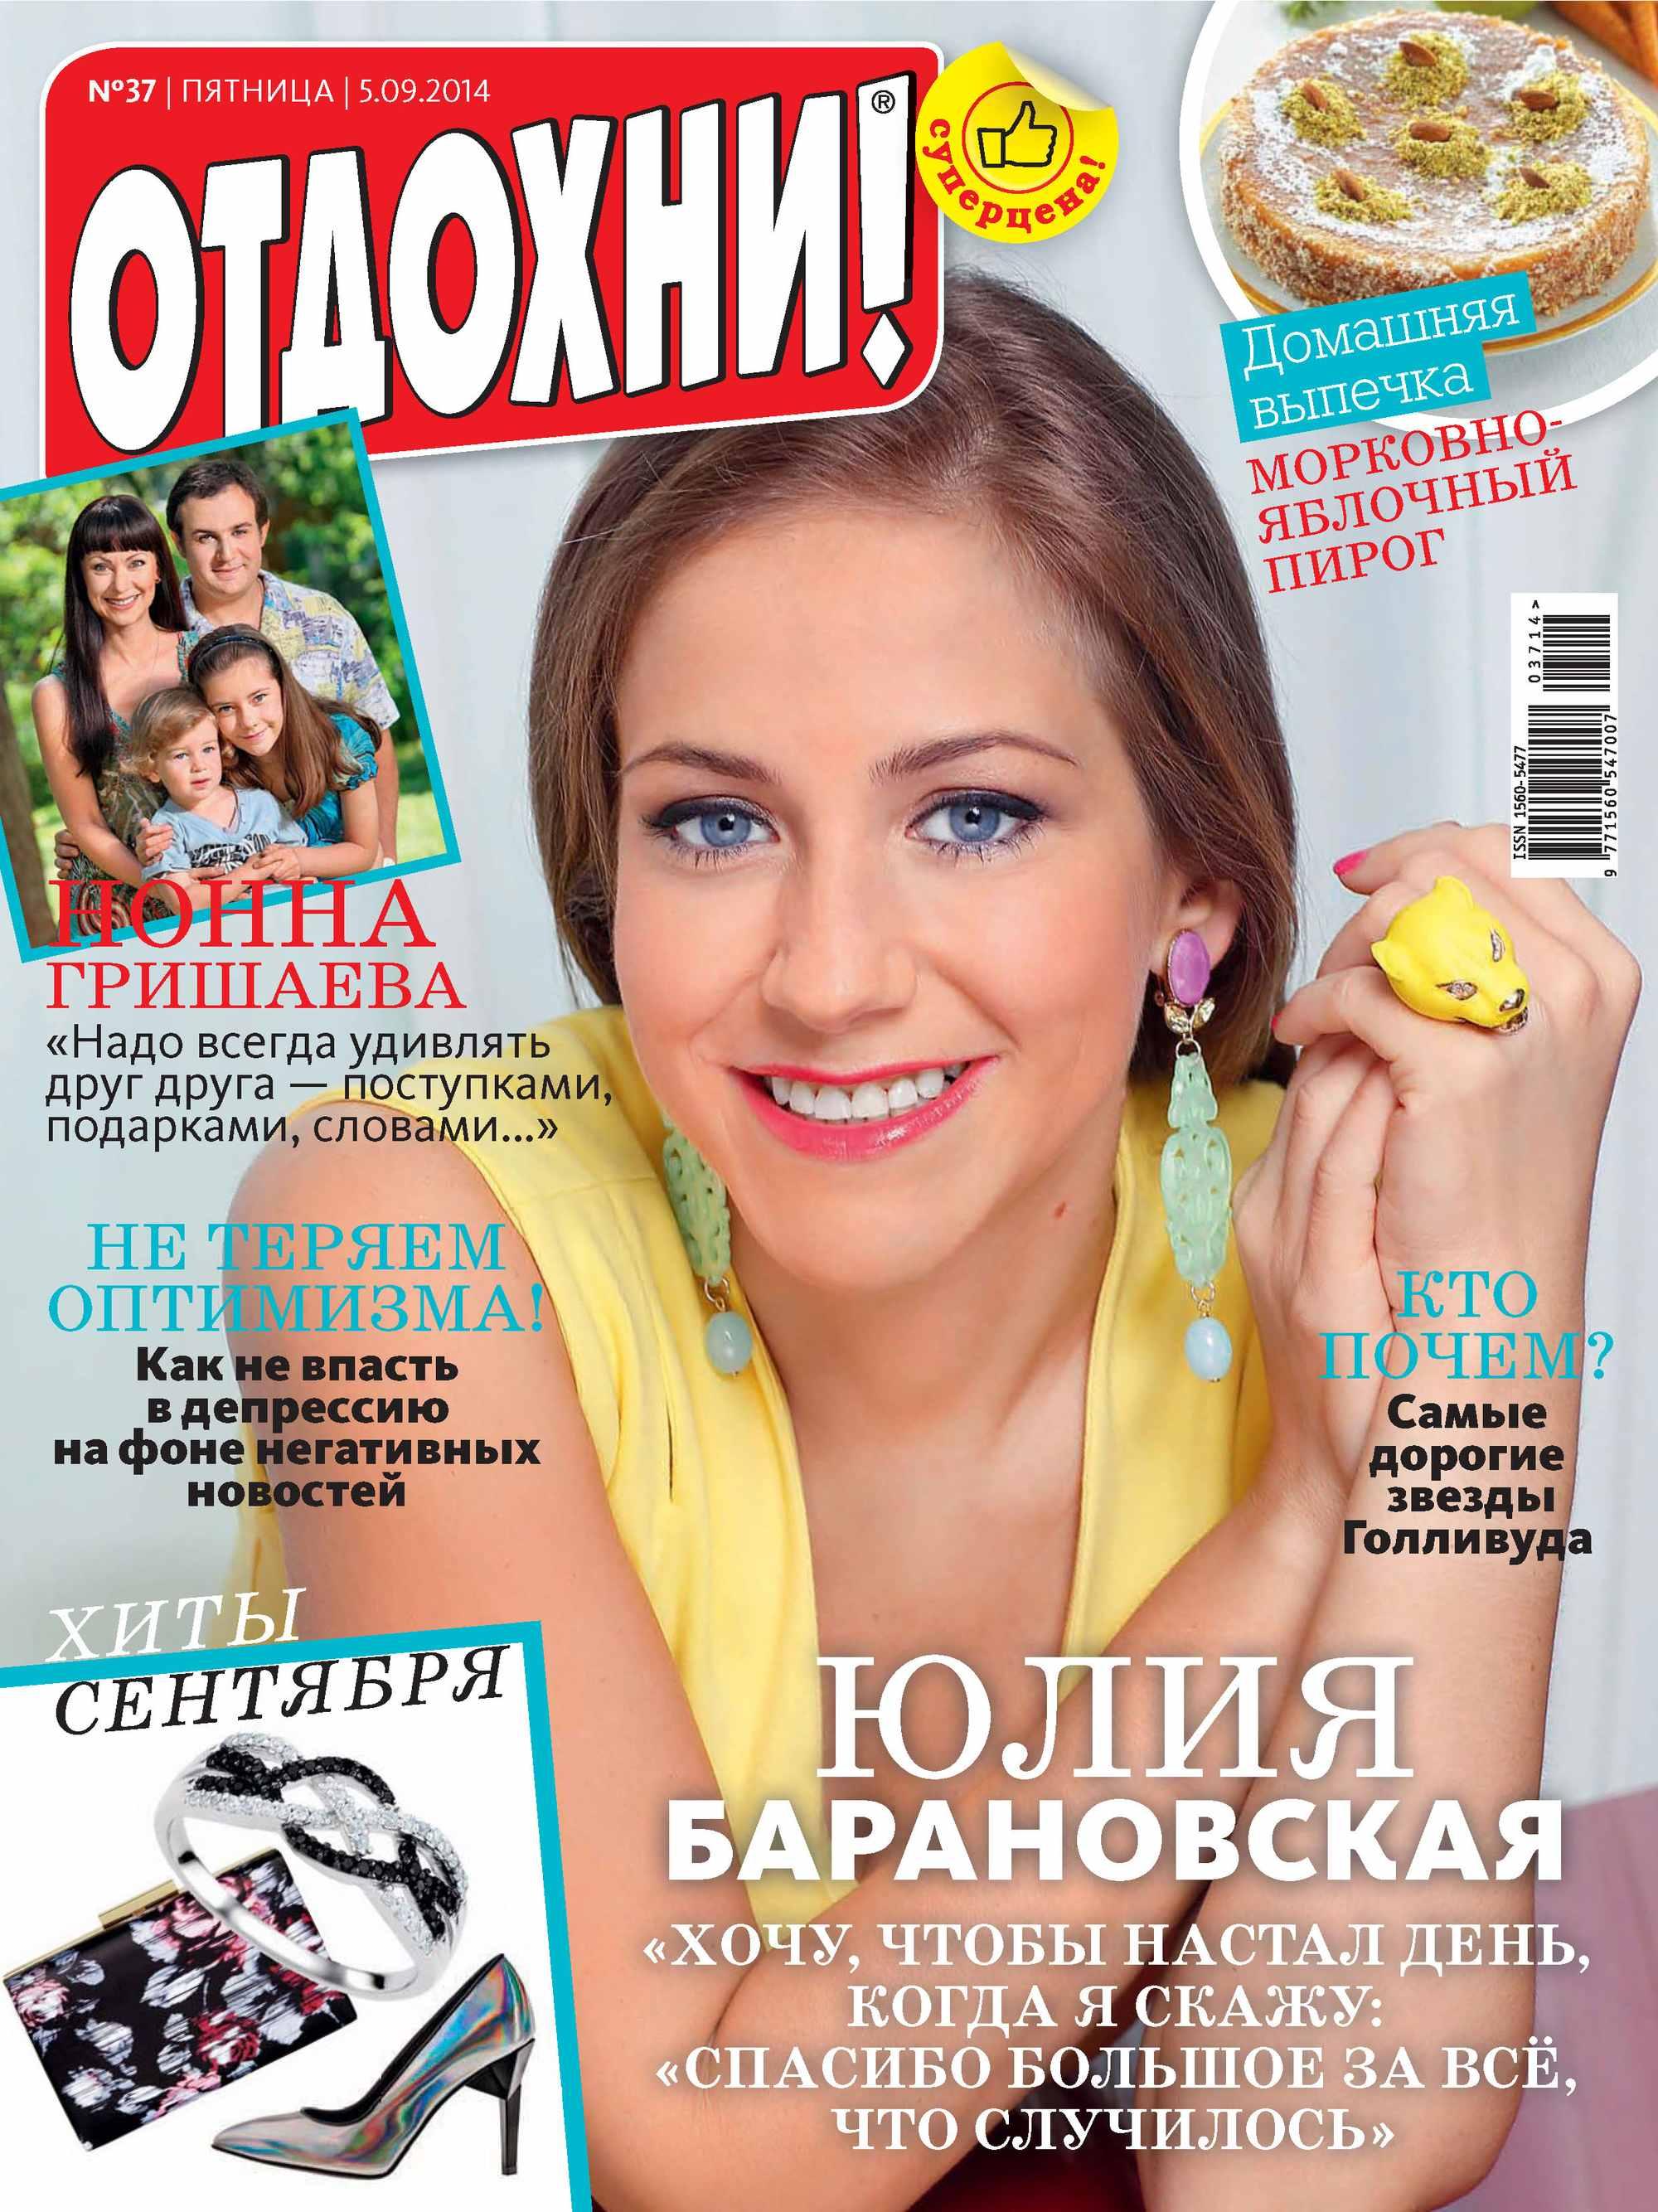 ИД «Бурда» Журнал «Отдохни!» №37/2014 цена